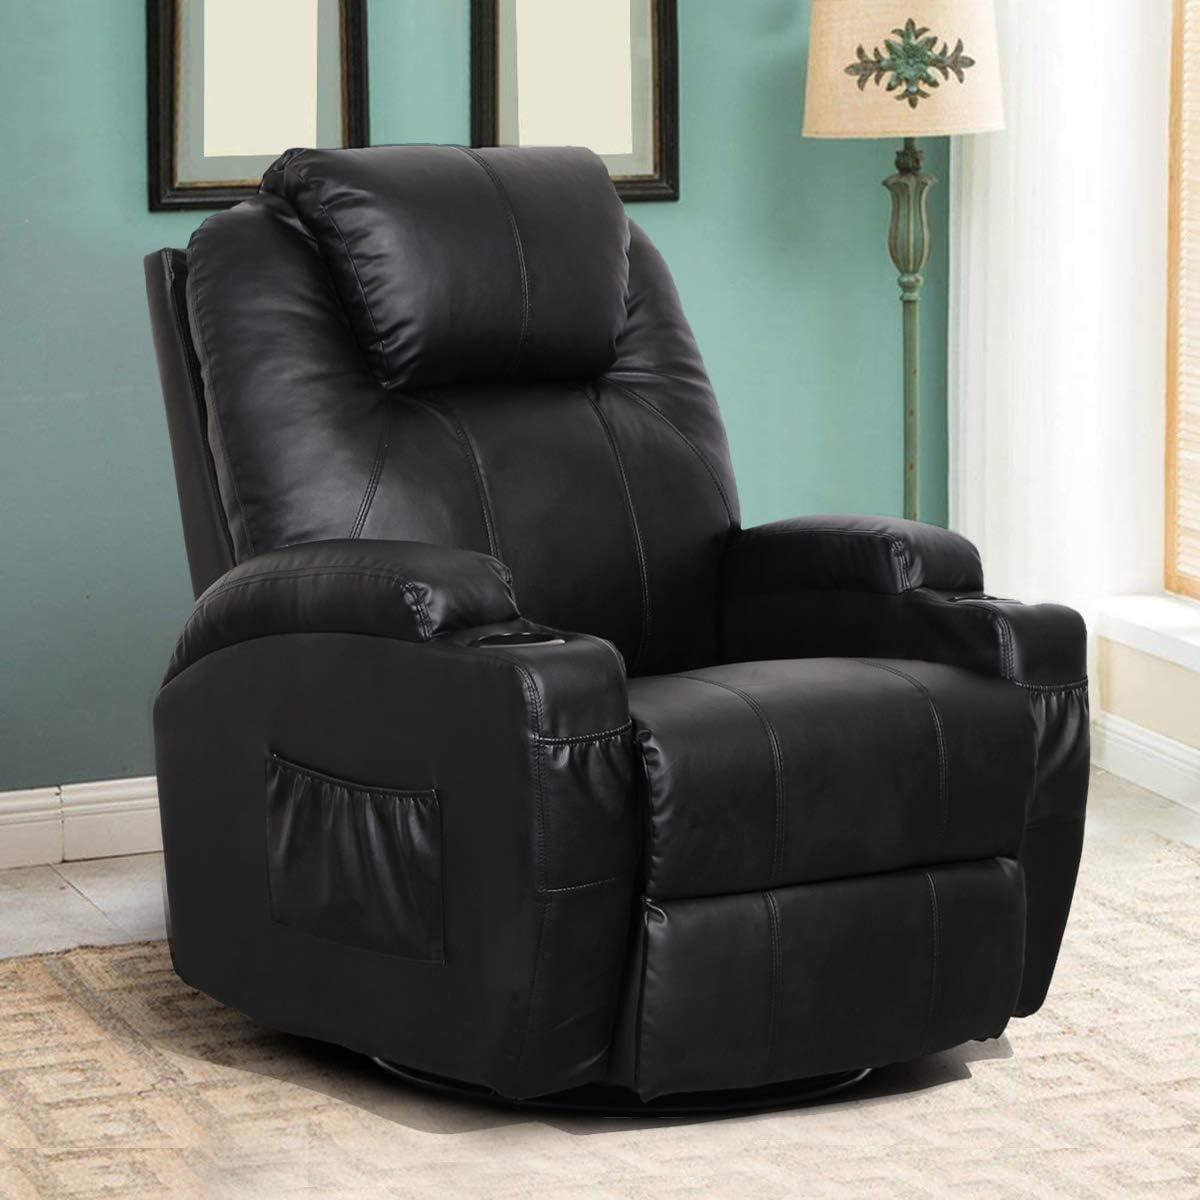 Esright Massage Recliner PU Leather Ergonomic Lounge Heated Chair 360 Degree Swivel Recliner Black